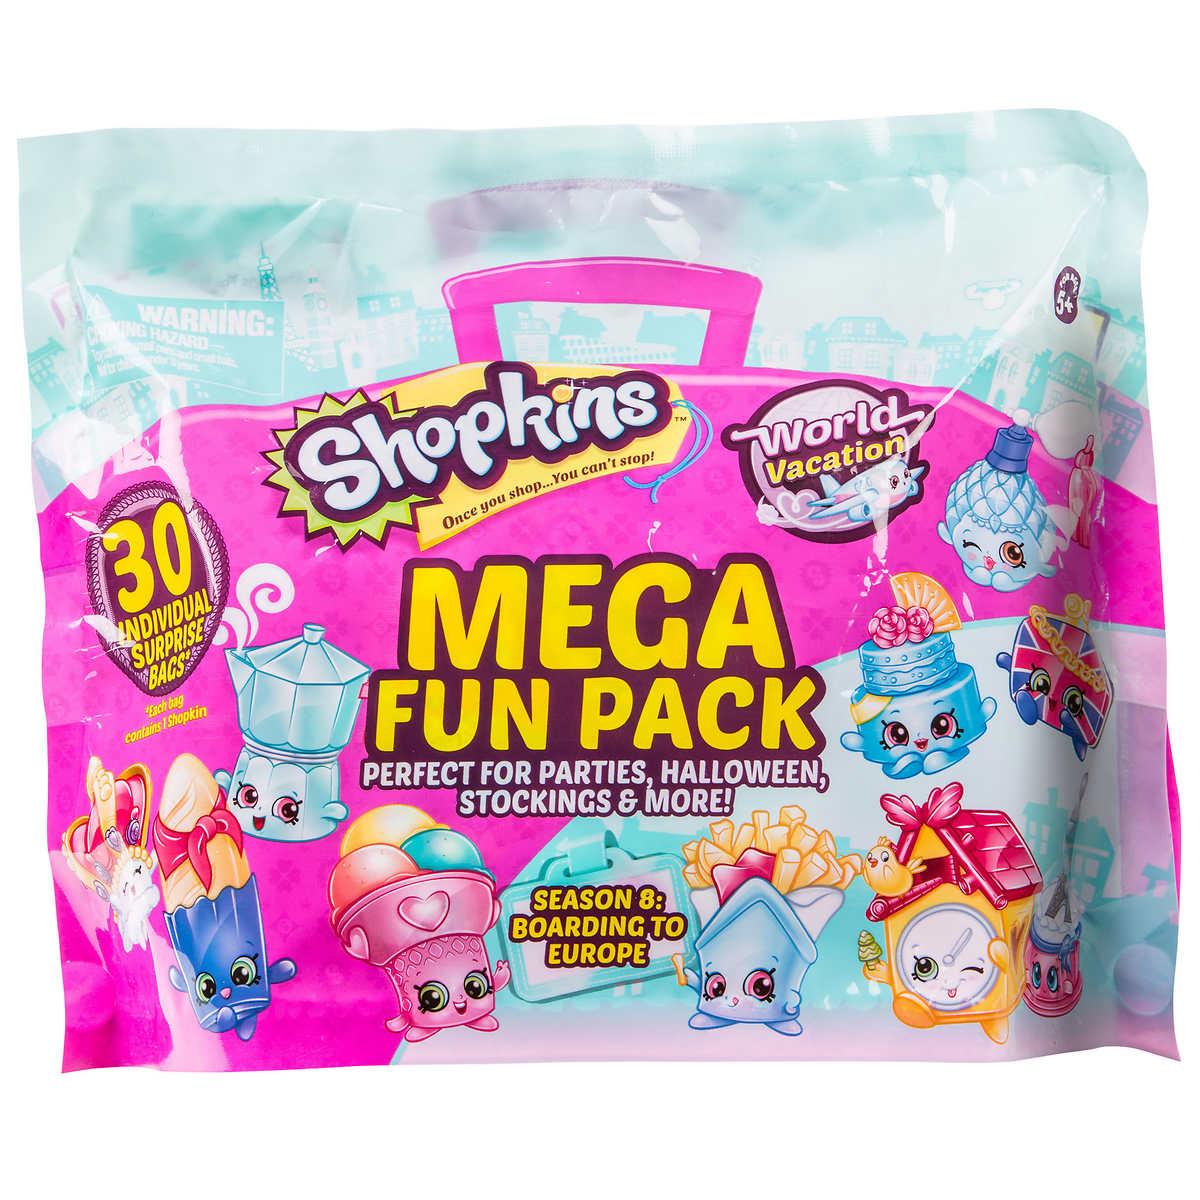 Mega Fun Blind Bags Pack 30 Count - Shopkins 30 Individual Surprise Bags Exclusive Series